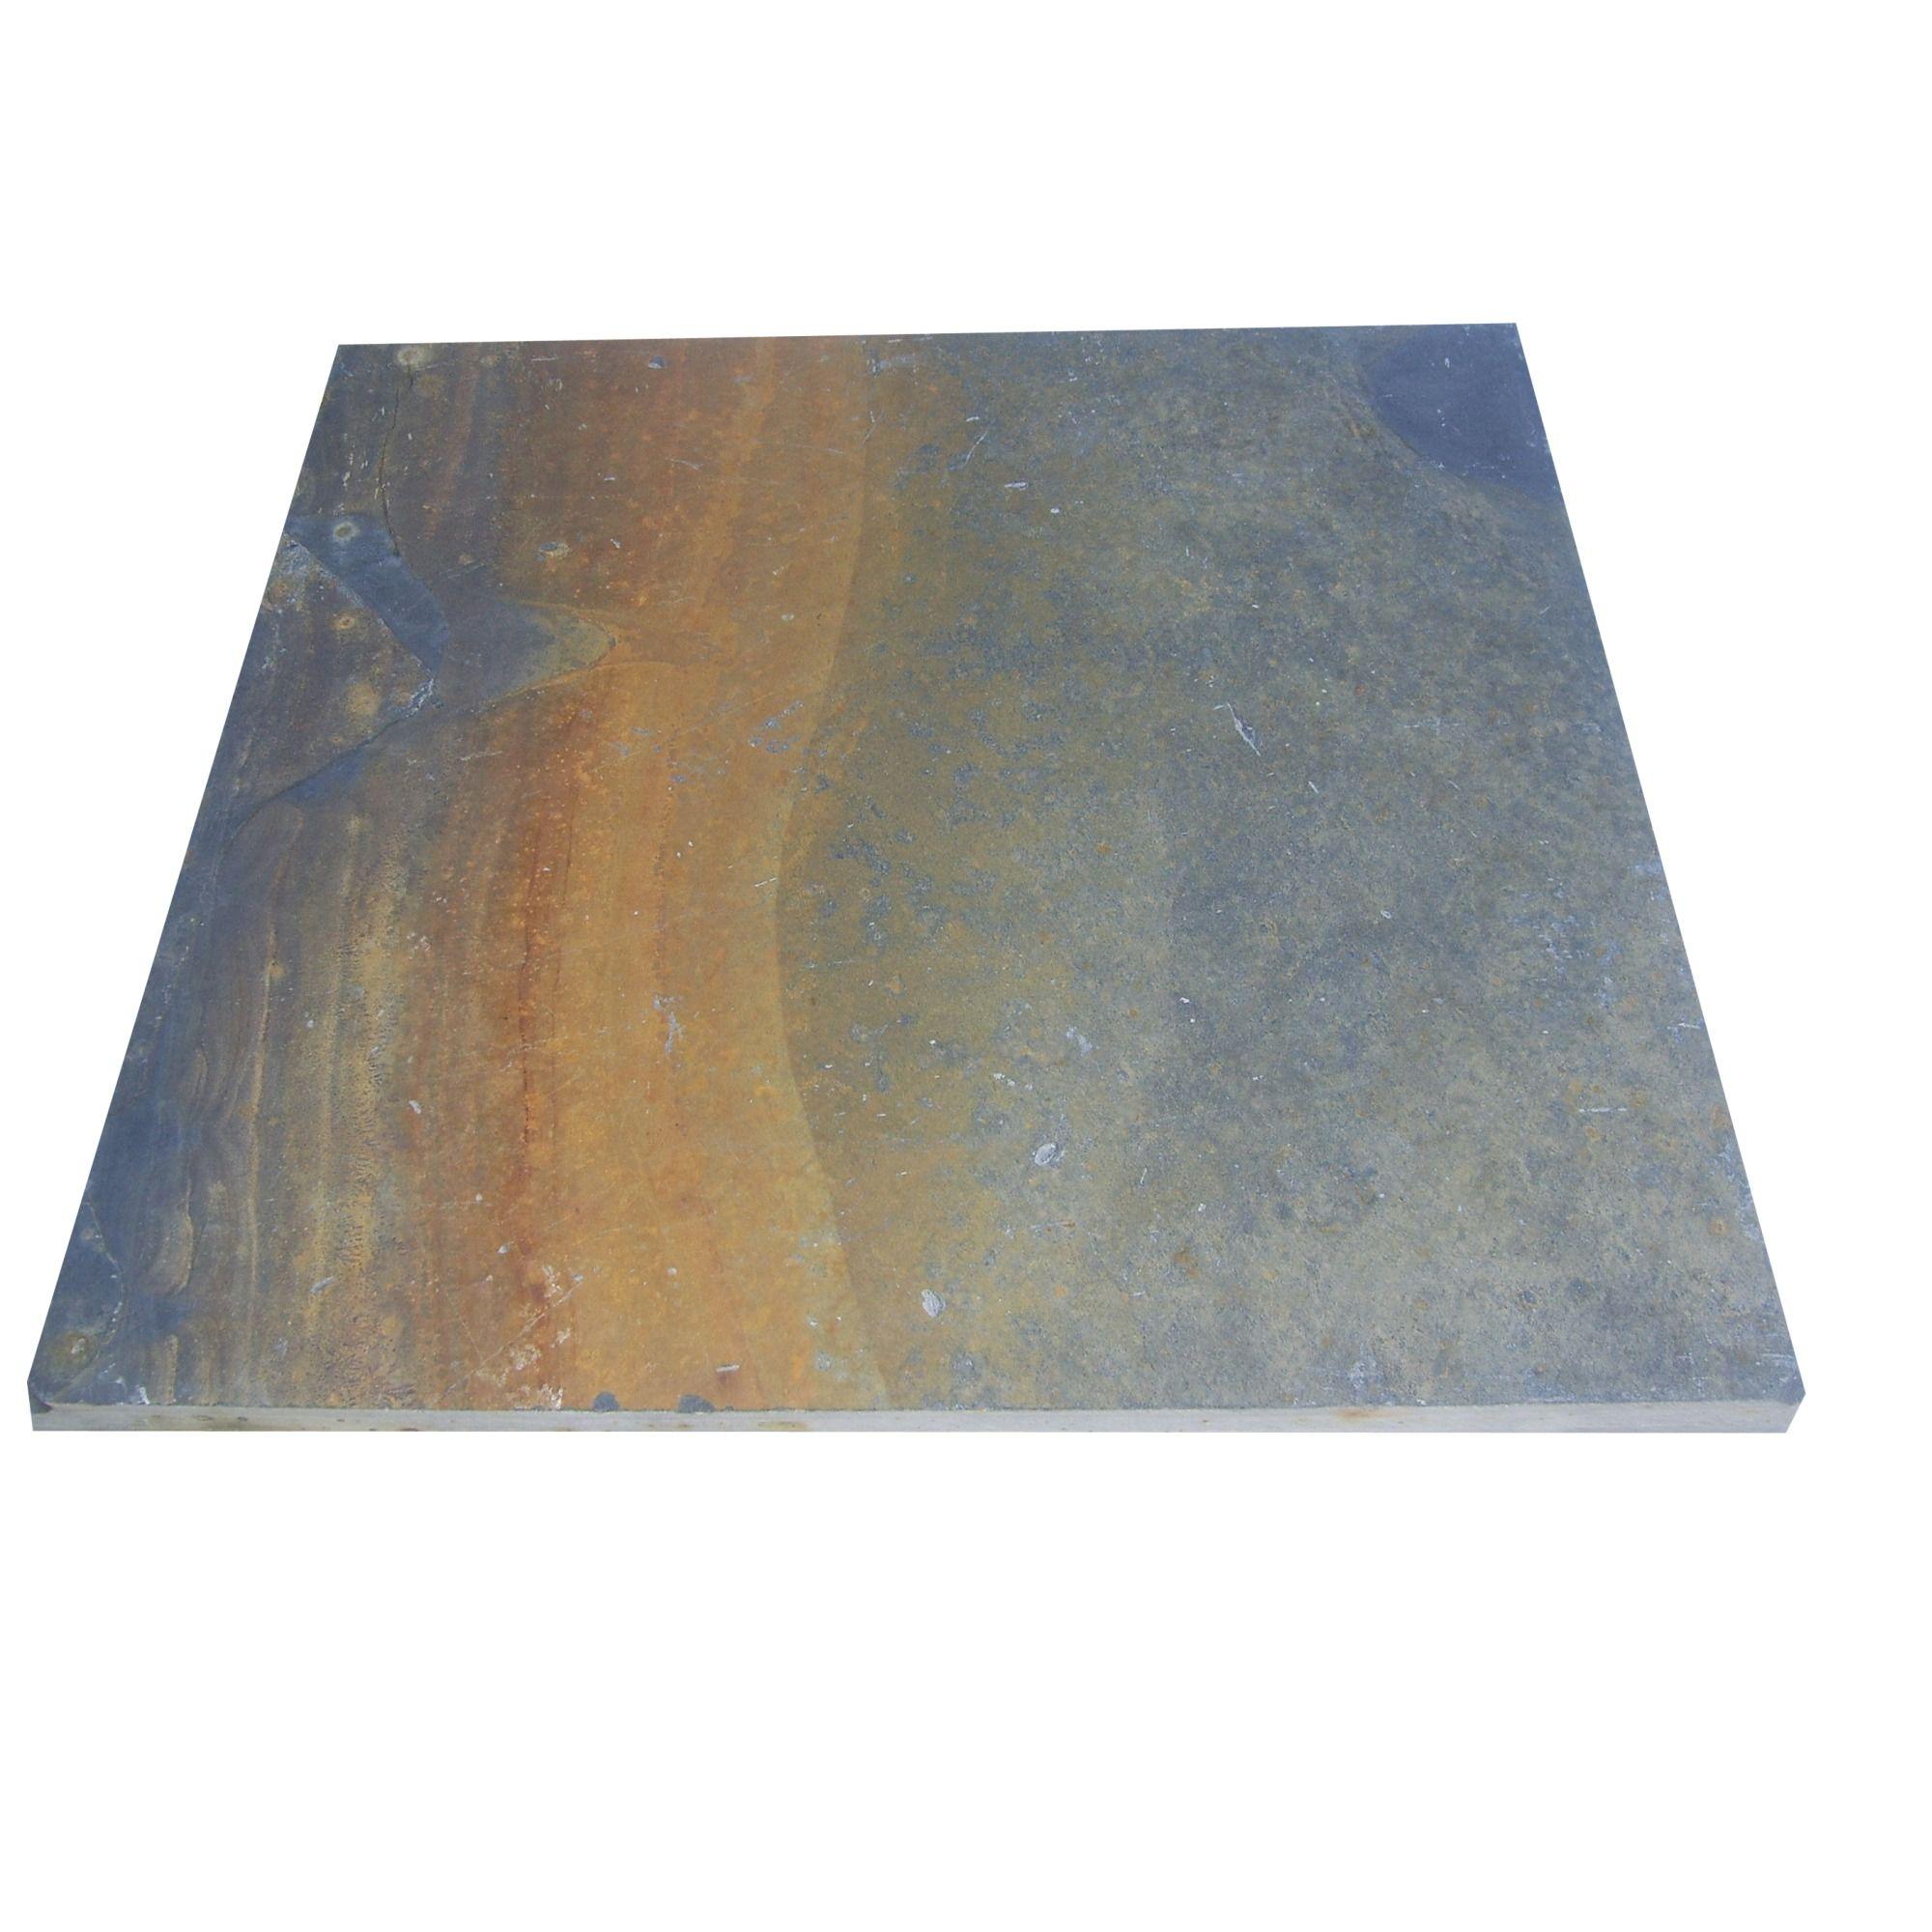 Terrastegel 60 x 60 x 2cm pallet roestkleur Tegels, Tuin